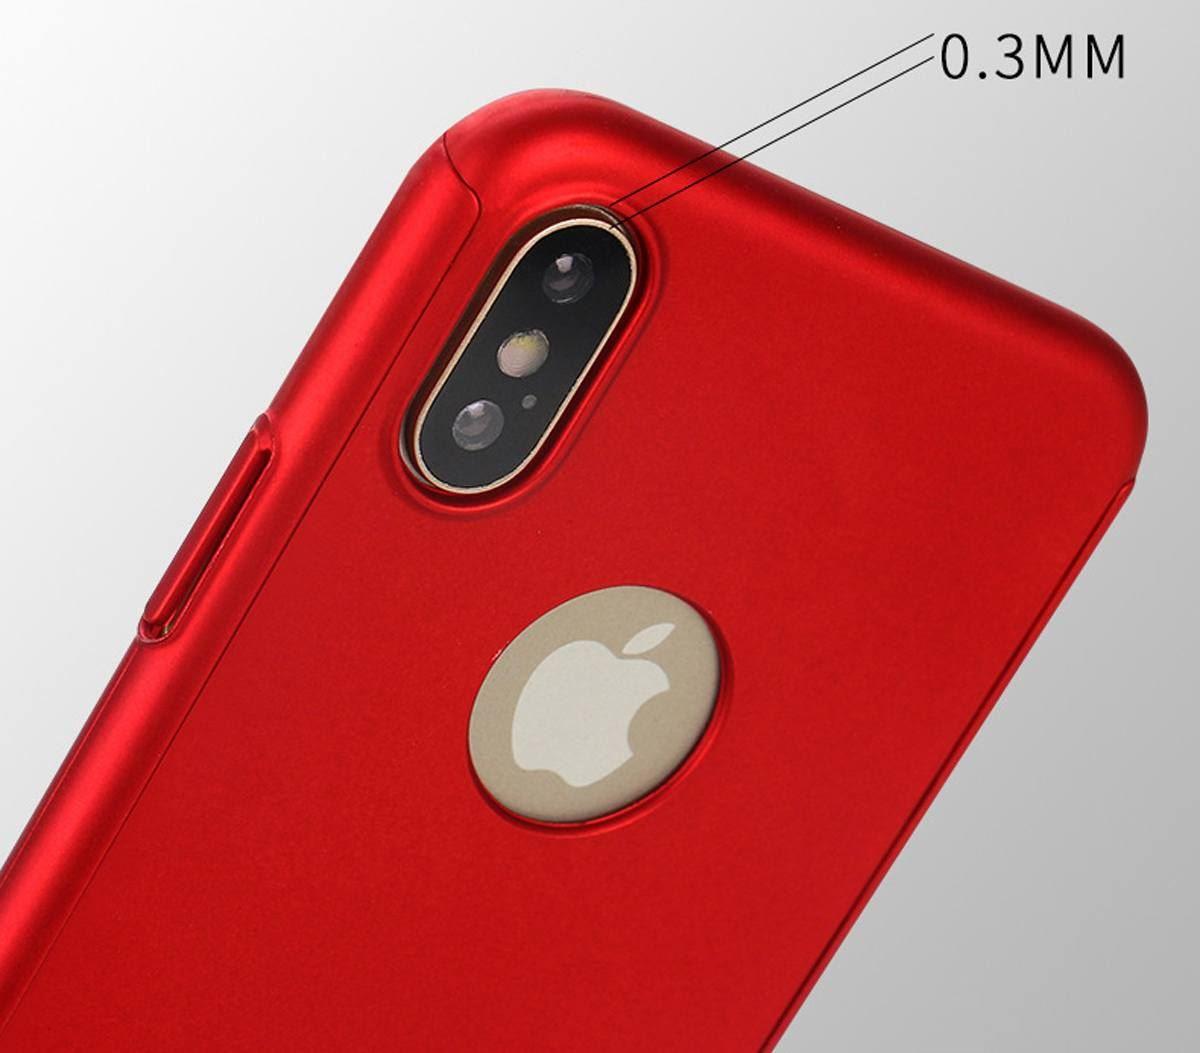 For-Apple-iPhone-XS-Max-XR-Hybrid-360-Slim-Ultra-Thin-Heavy-Duty-Shockproof-Case Indexbild 76